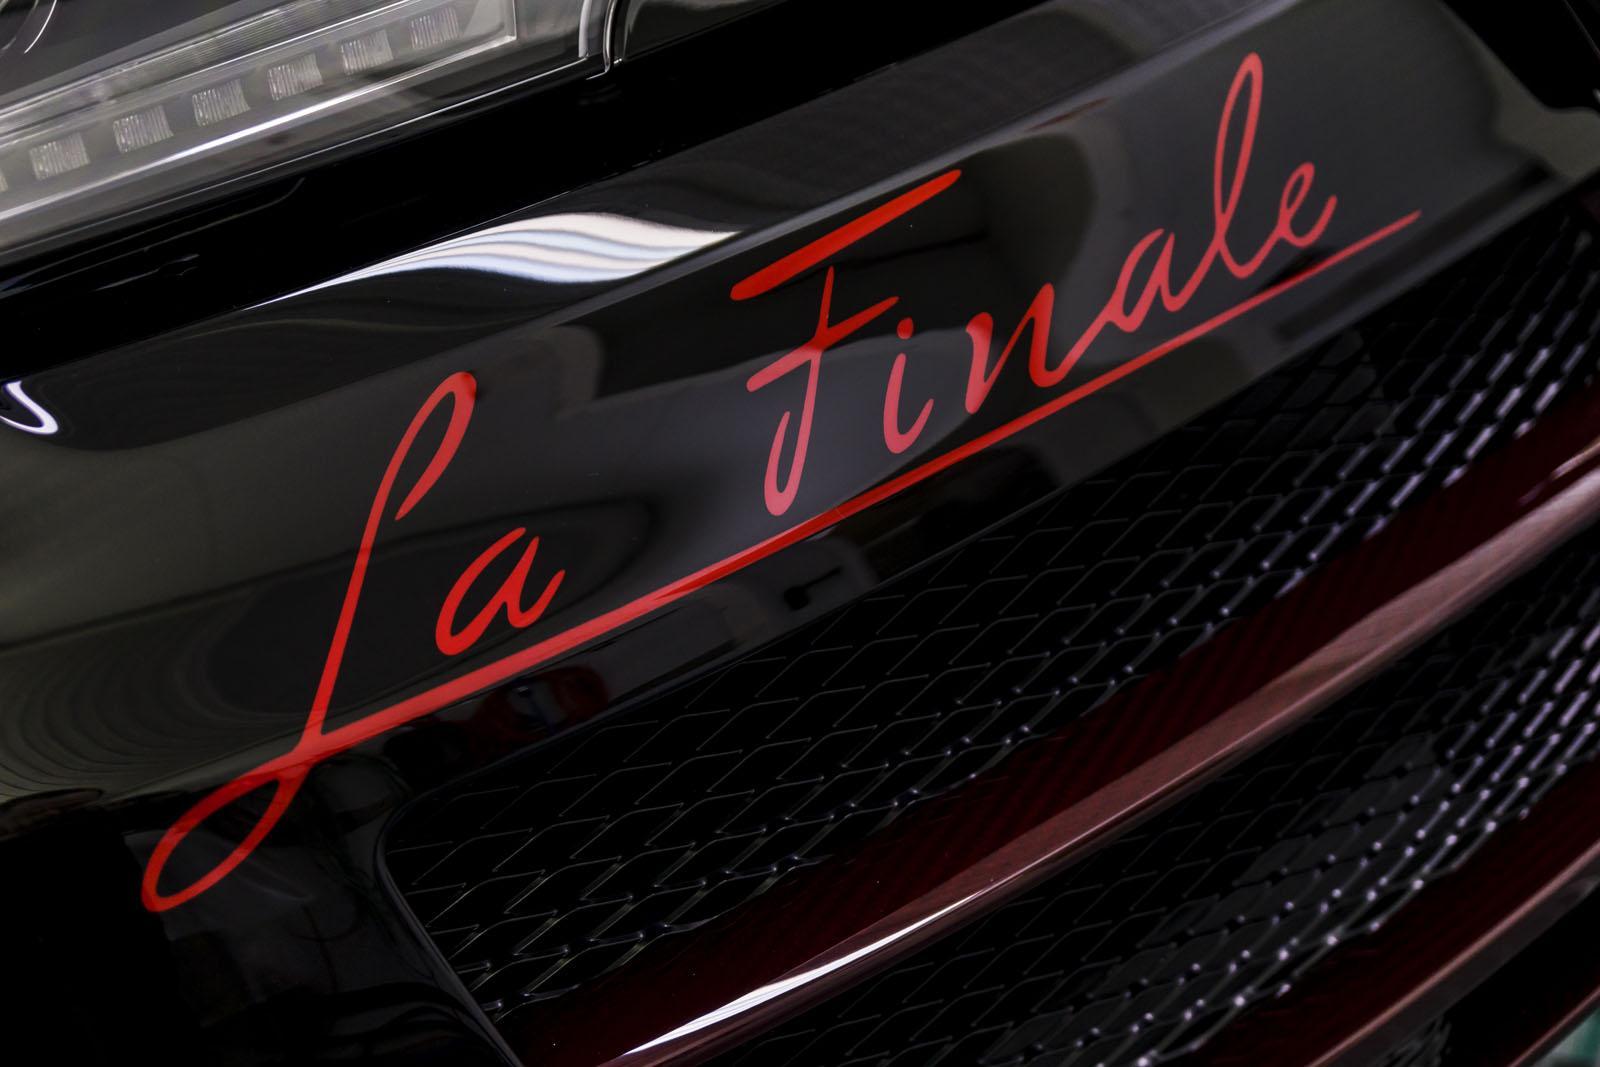 2015 bugatti veyron grand sport vitesse la finale 16 egmcartech. Black Bedroom Furniture Sets. Home Design Ideas